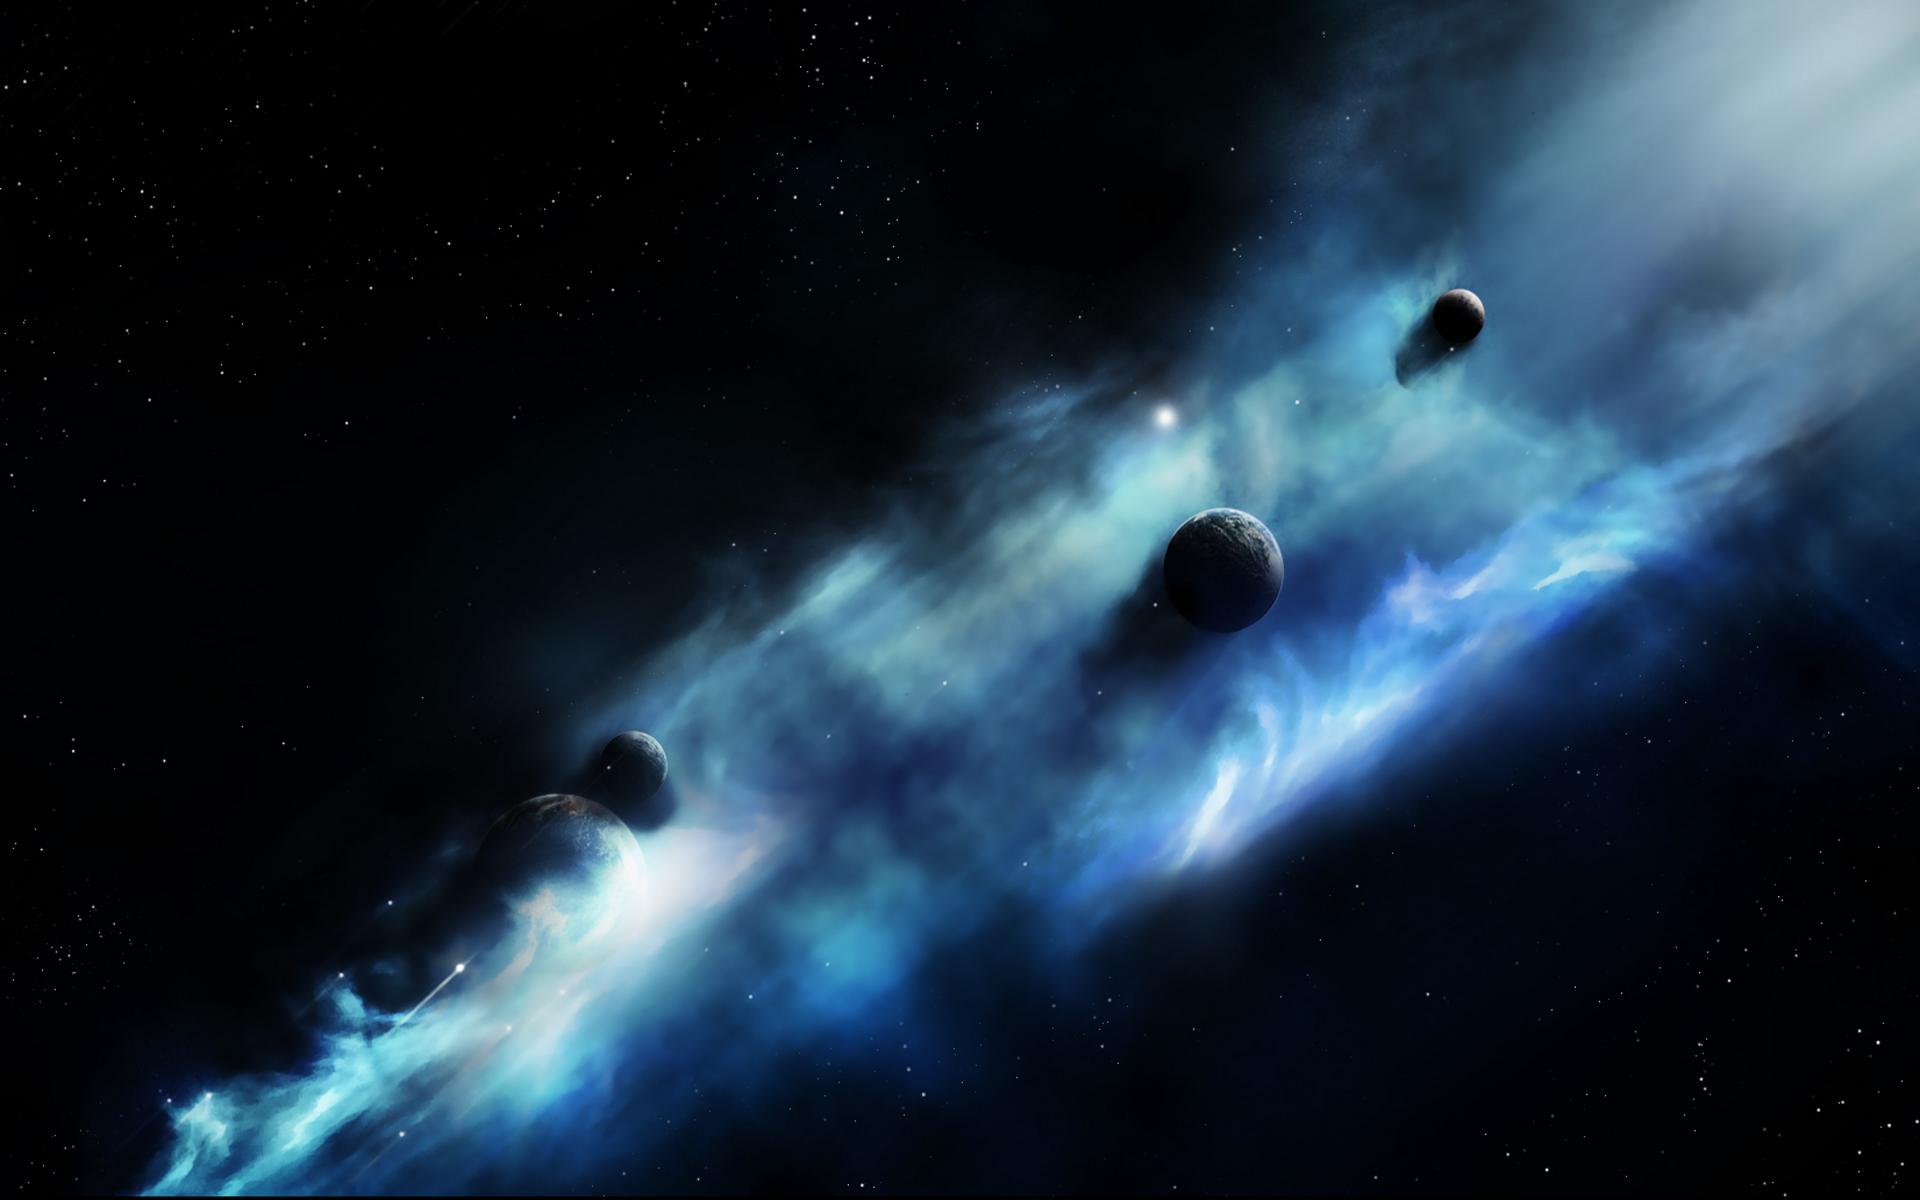 Sci Fi - Planets  Planet Galaxy Sci Fi Space Wallpaper